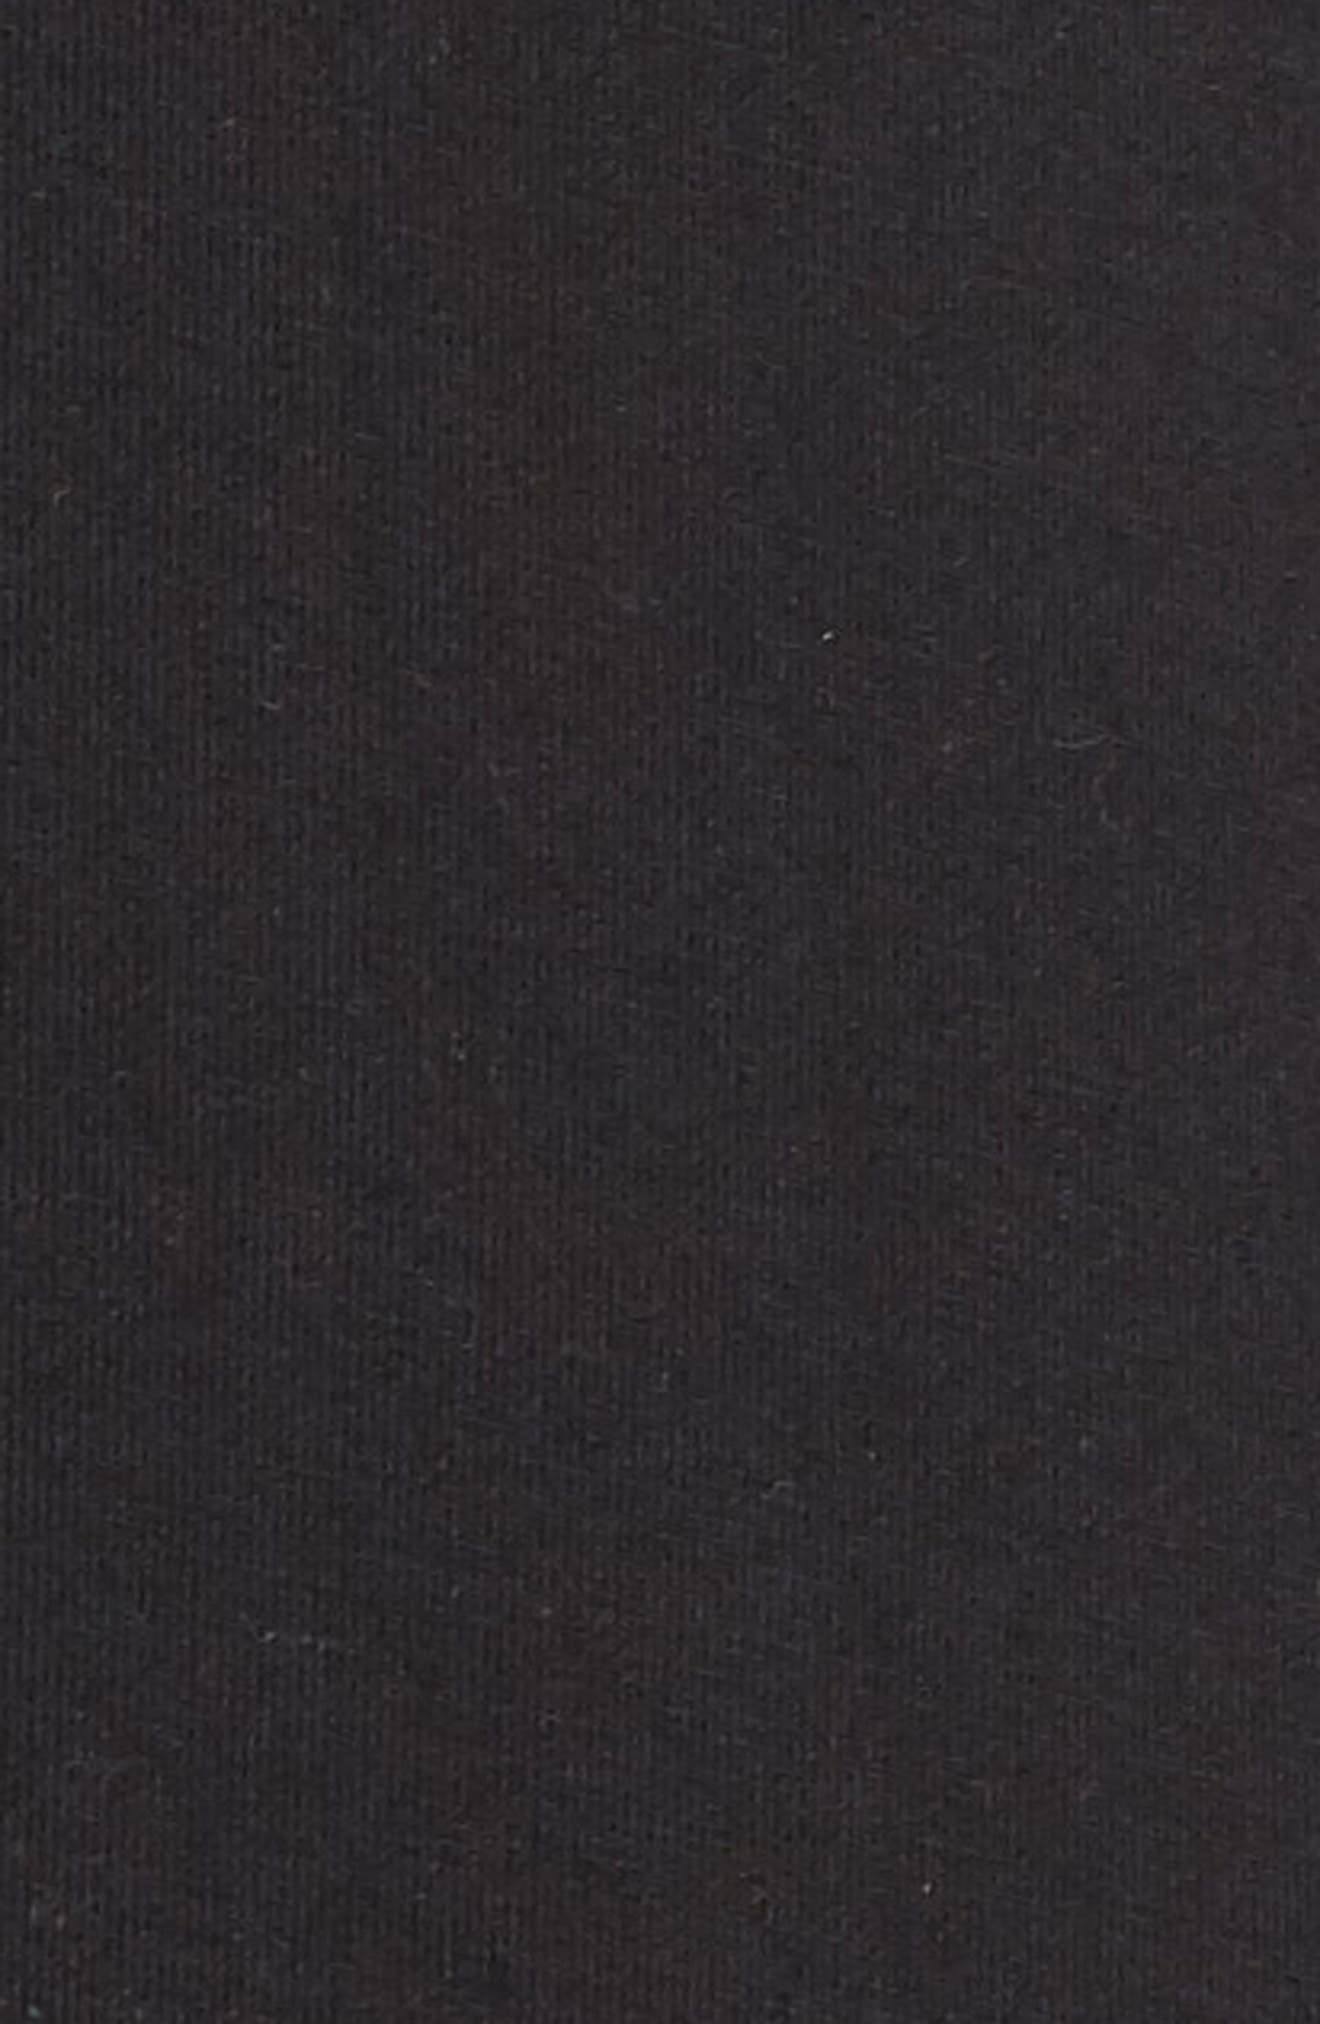 Dolman Sleeve Nightshirt,                             Alternate thumbnail 5, color,                             001